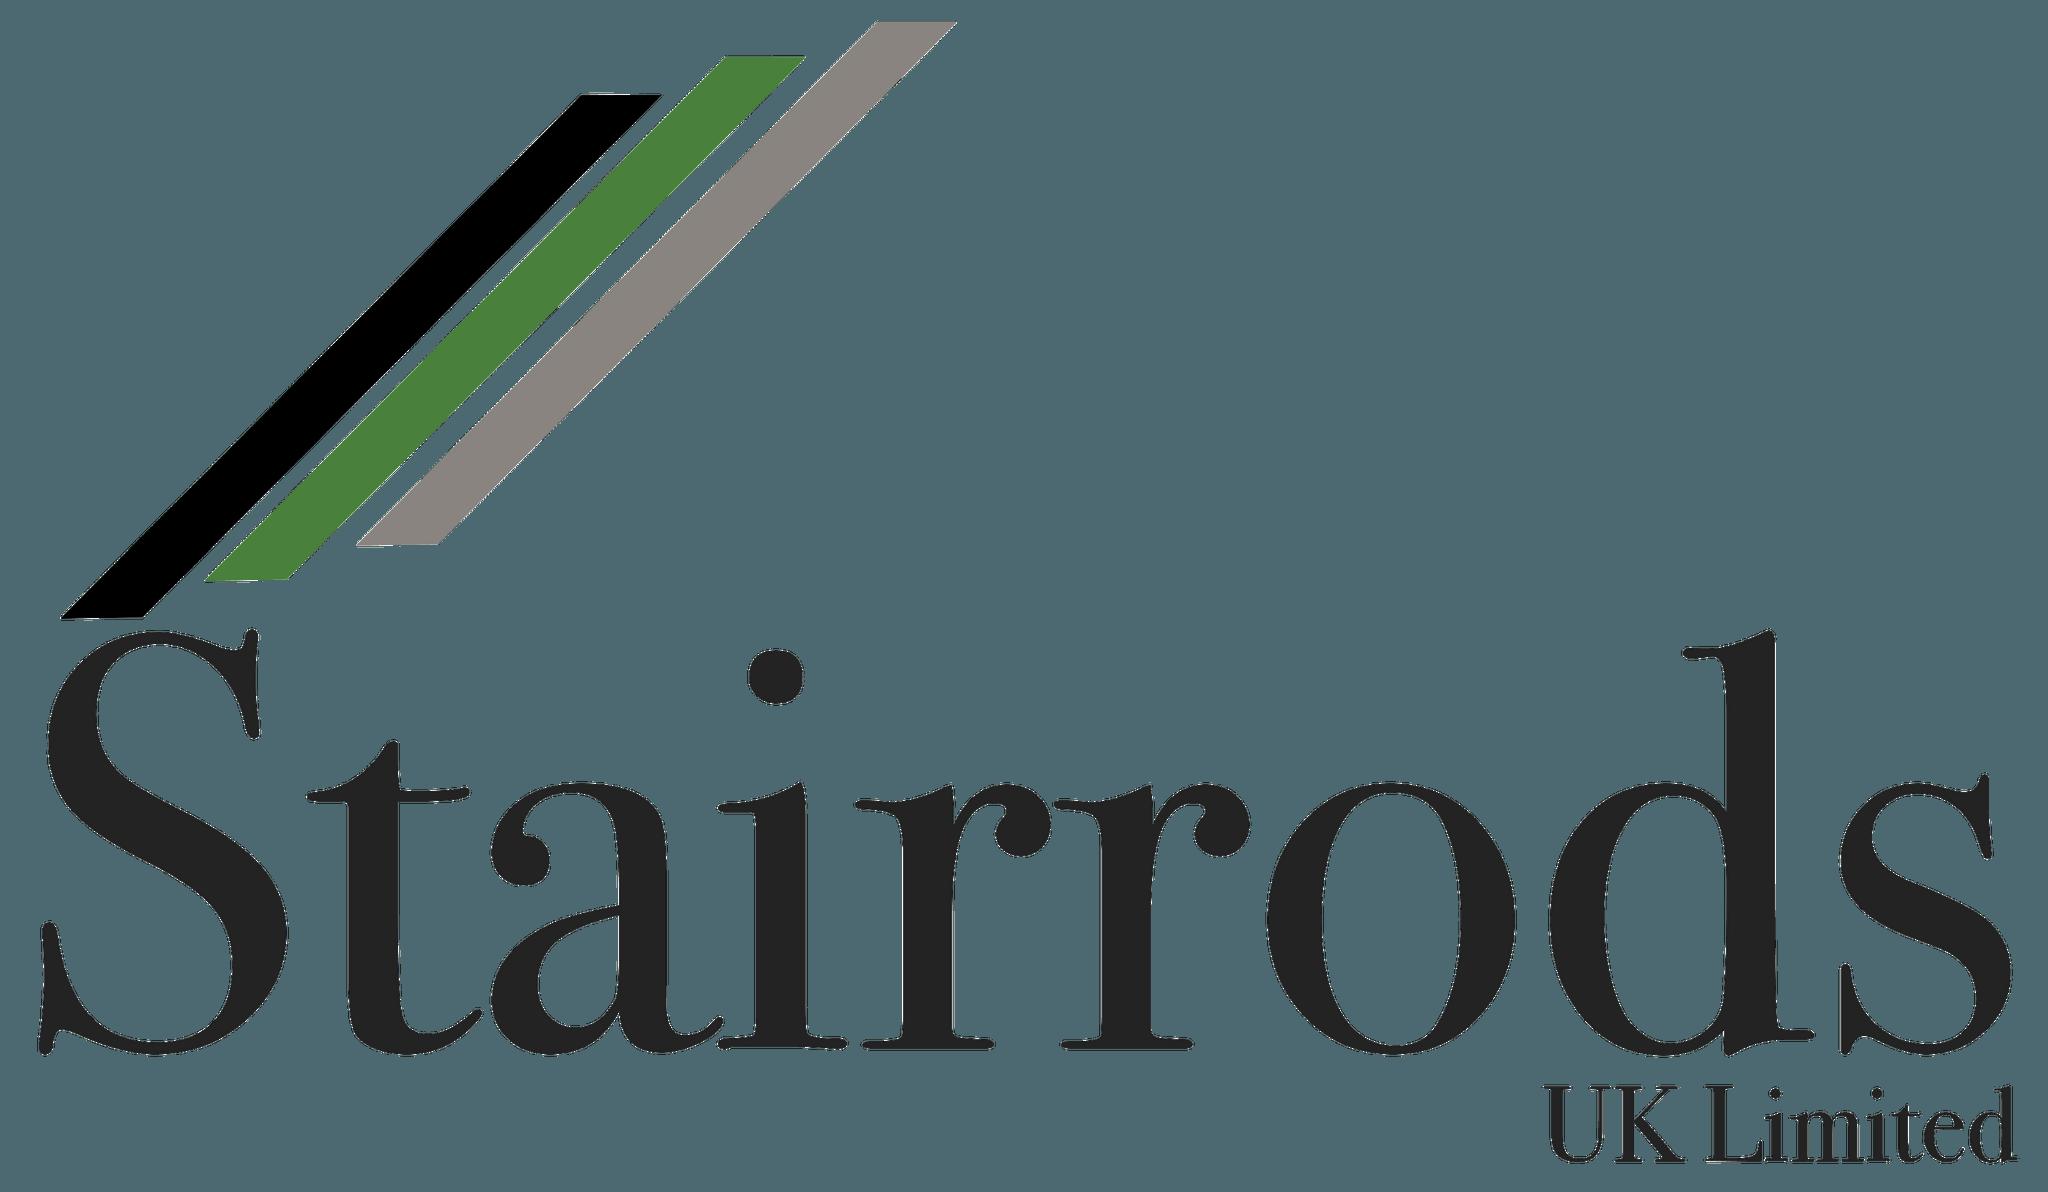 Stairrods (UK) Ltd